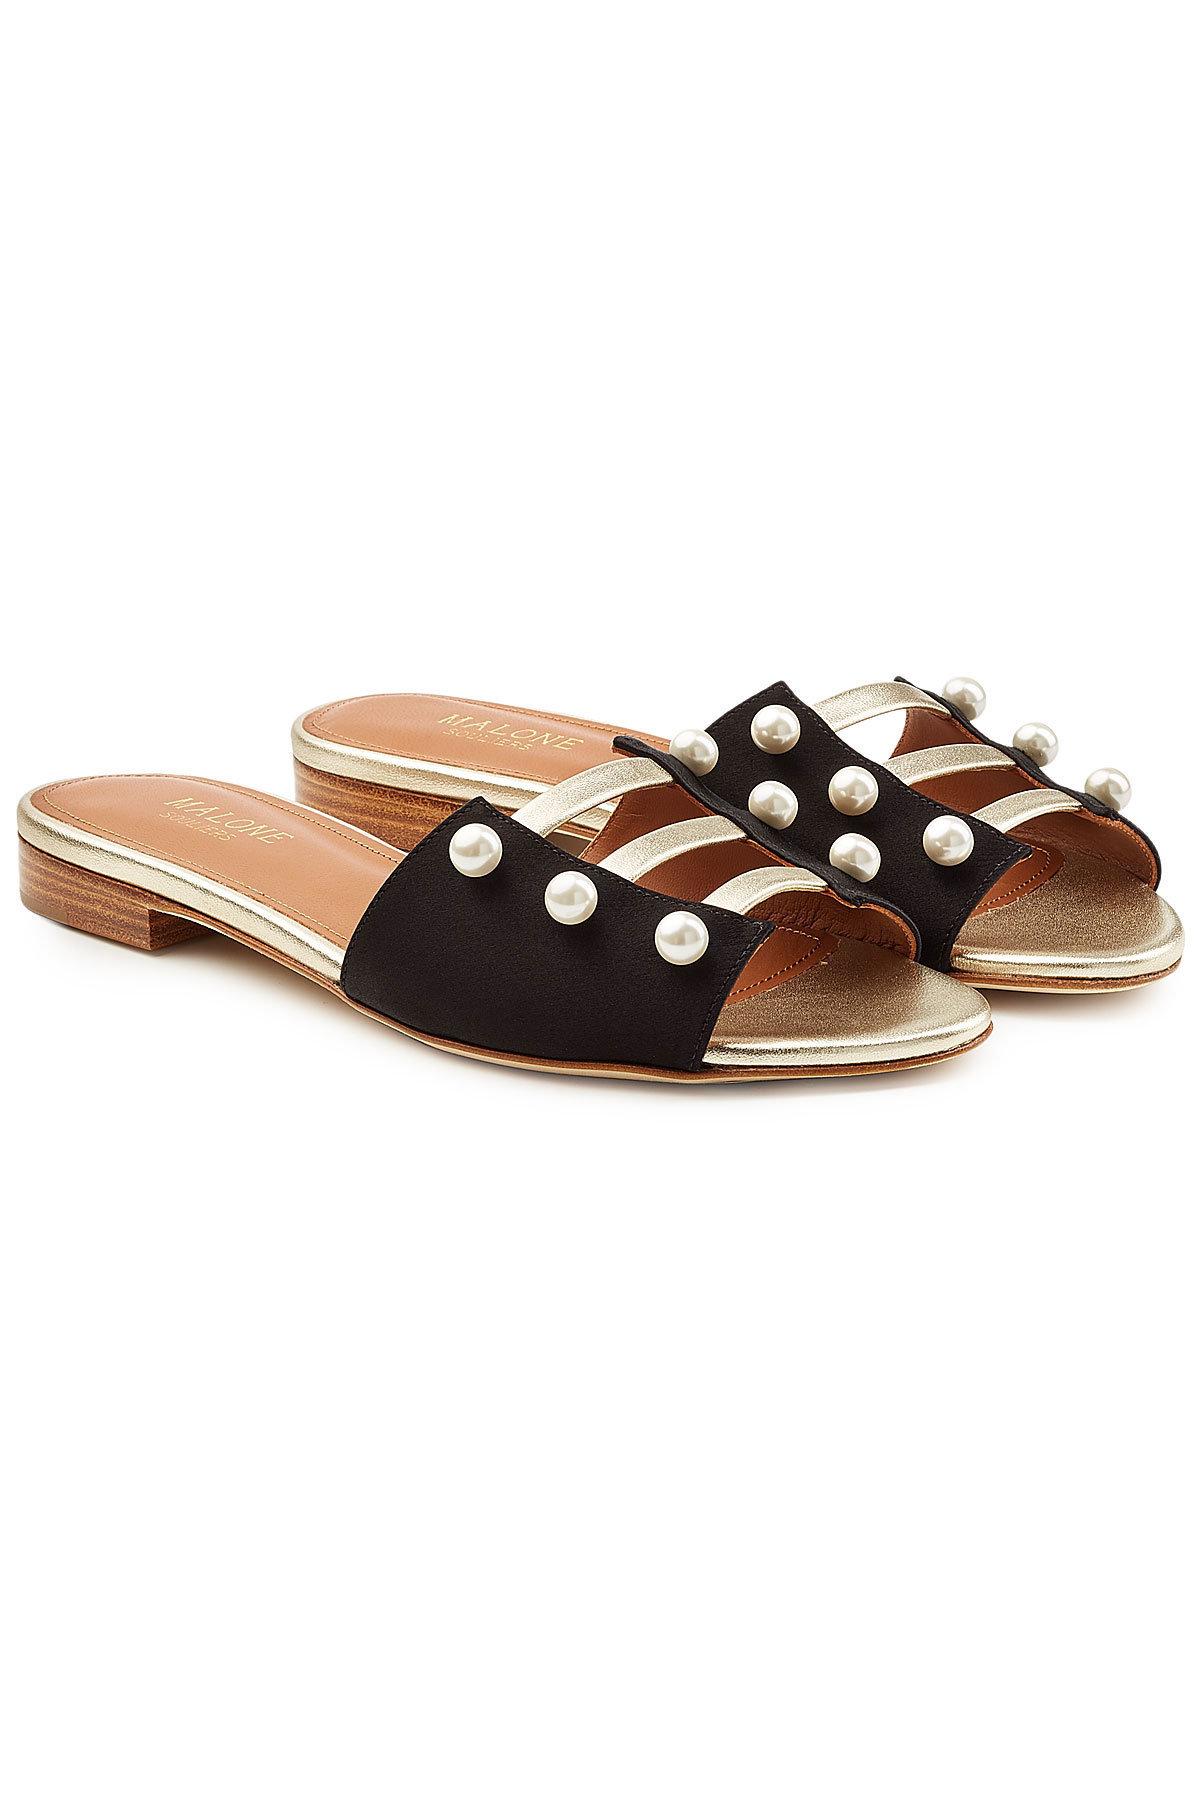 MALONE SOULIERS Zelda Leather Sandals with Faux Pearls Gr. EU 39 JiQwF